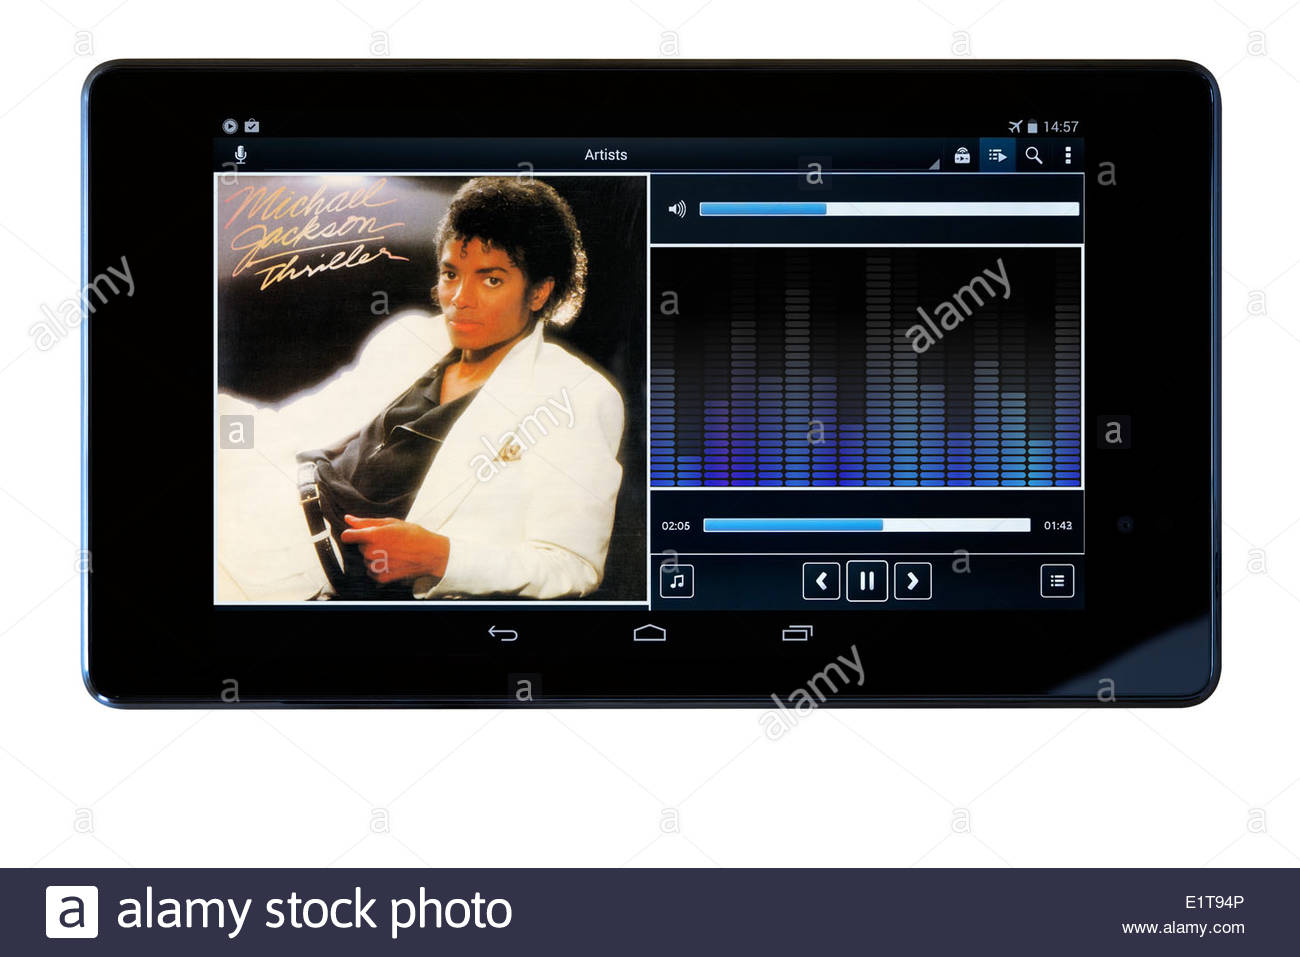 Thriller Michael Jackson – Mp3 Download | RetroJamz